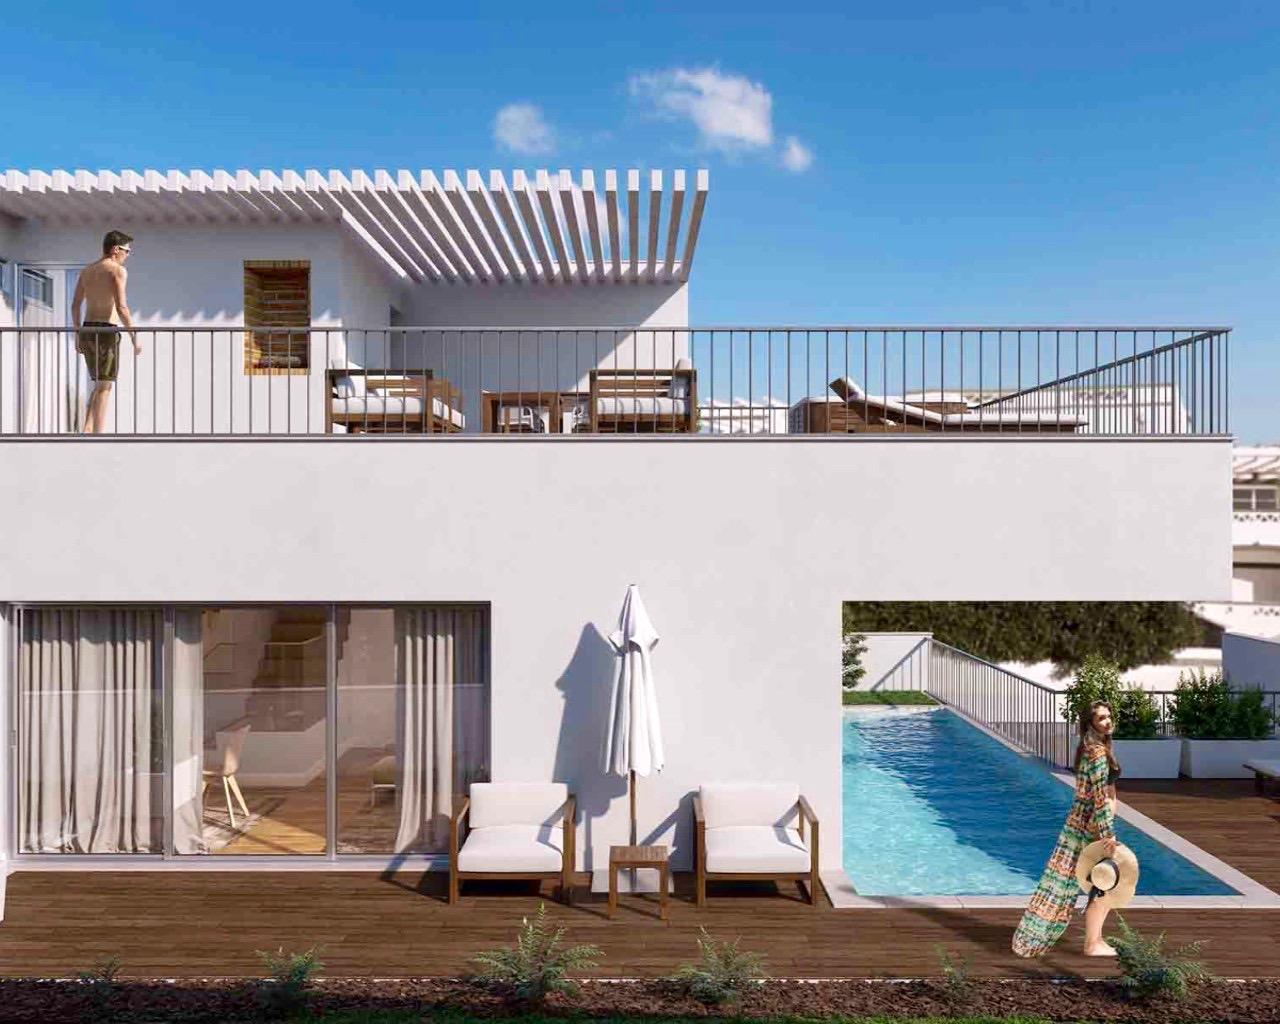 Villa contemporaine de 3 chambres avec piscine individuelle, terrasses à Ferragudo  - Algarve